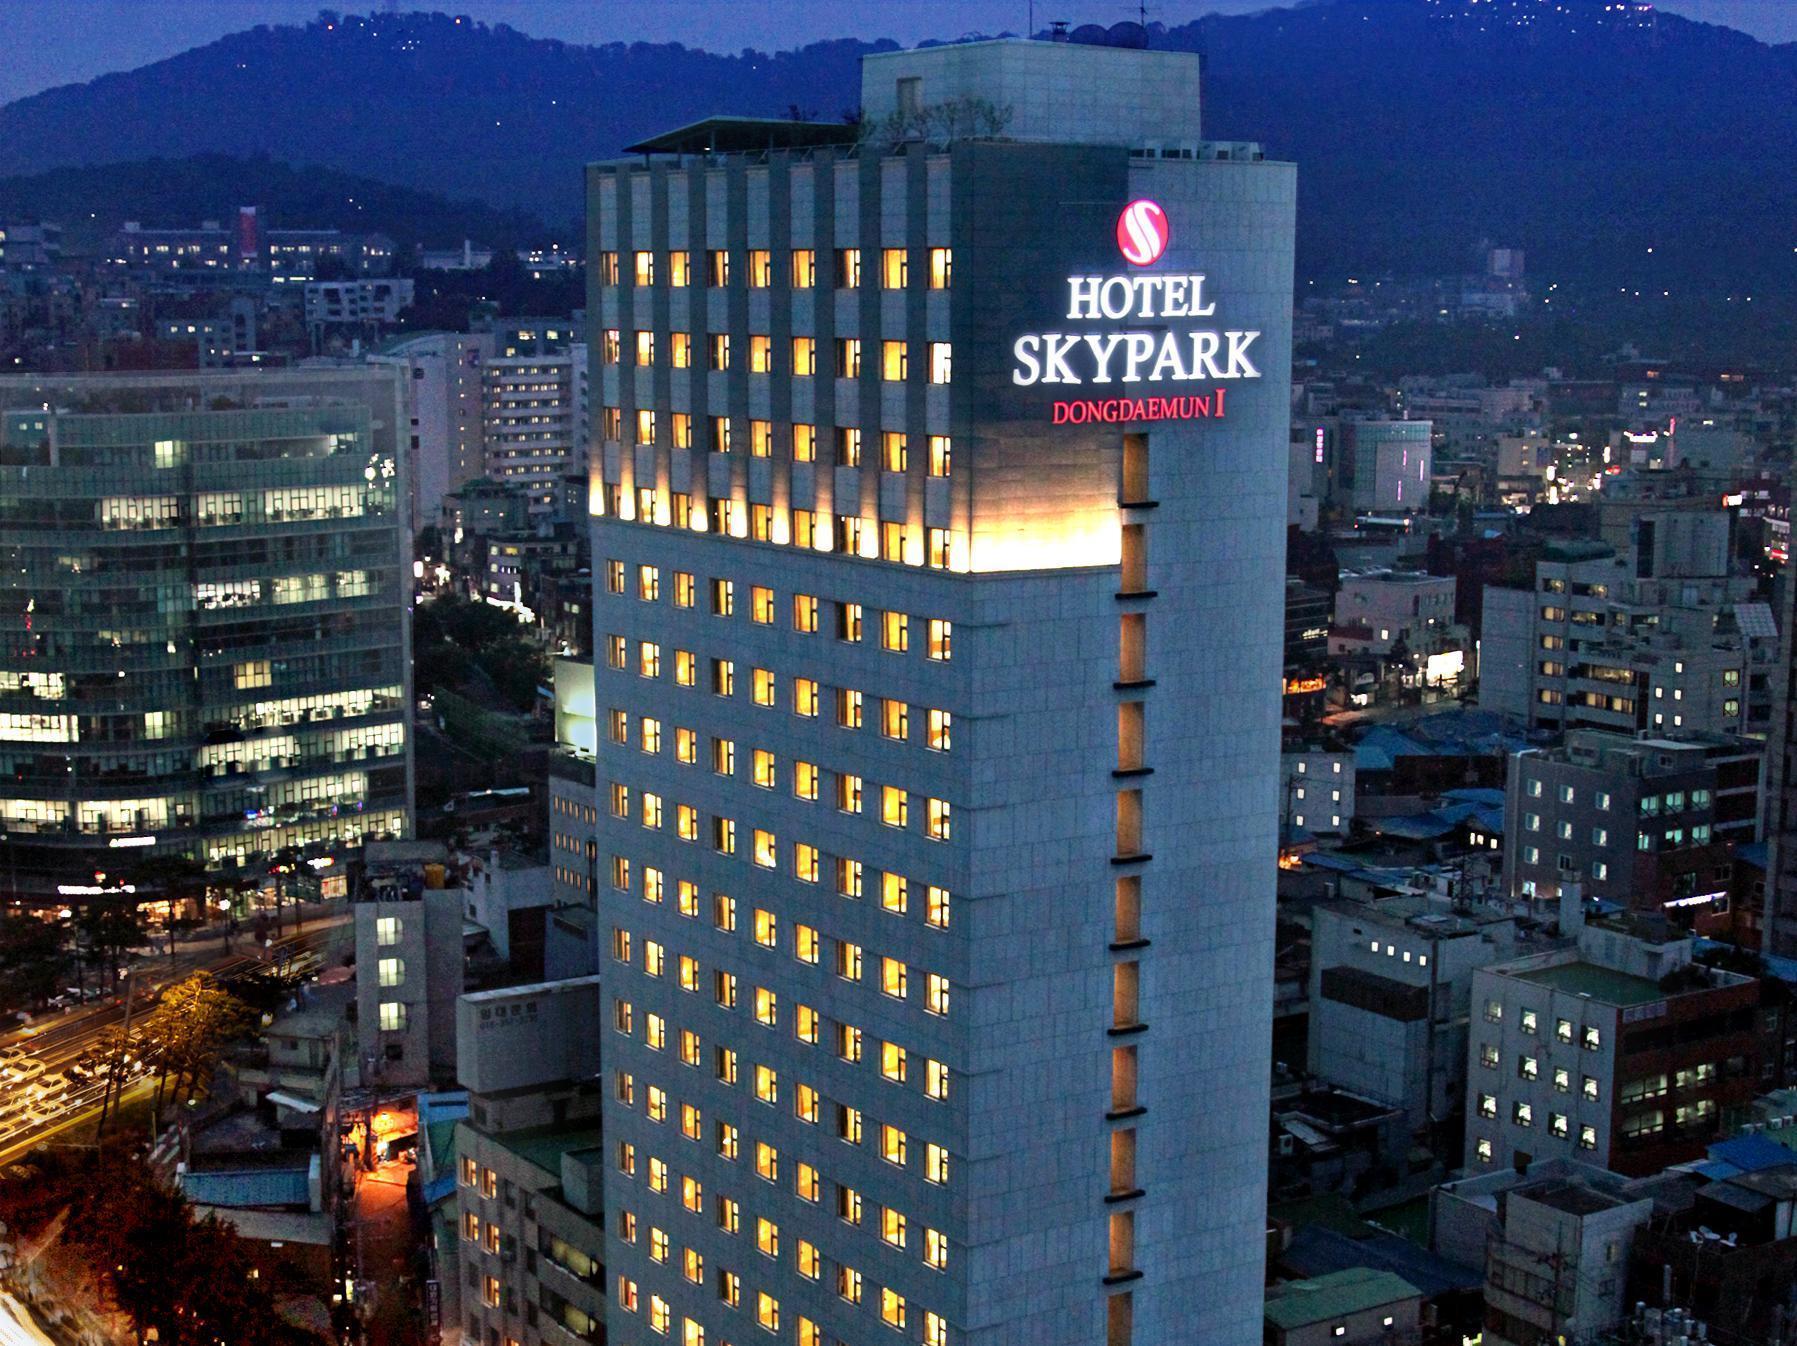 Hotel Skypark Dongdaemun I